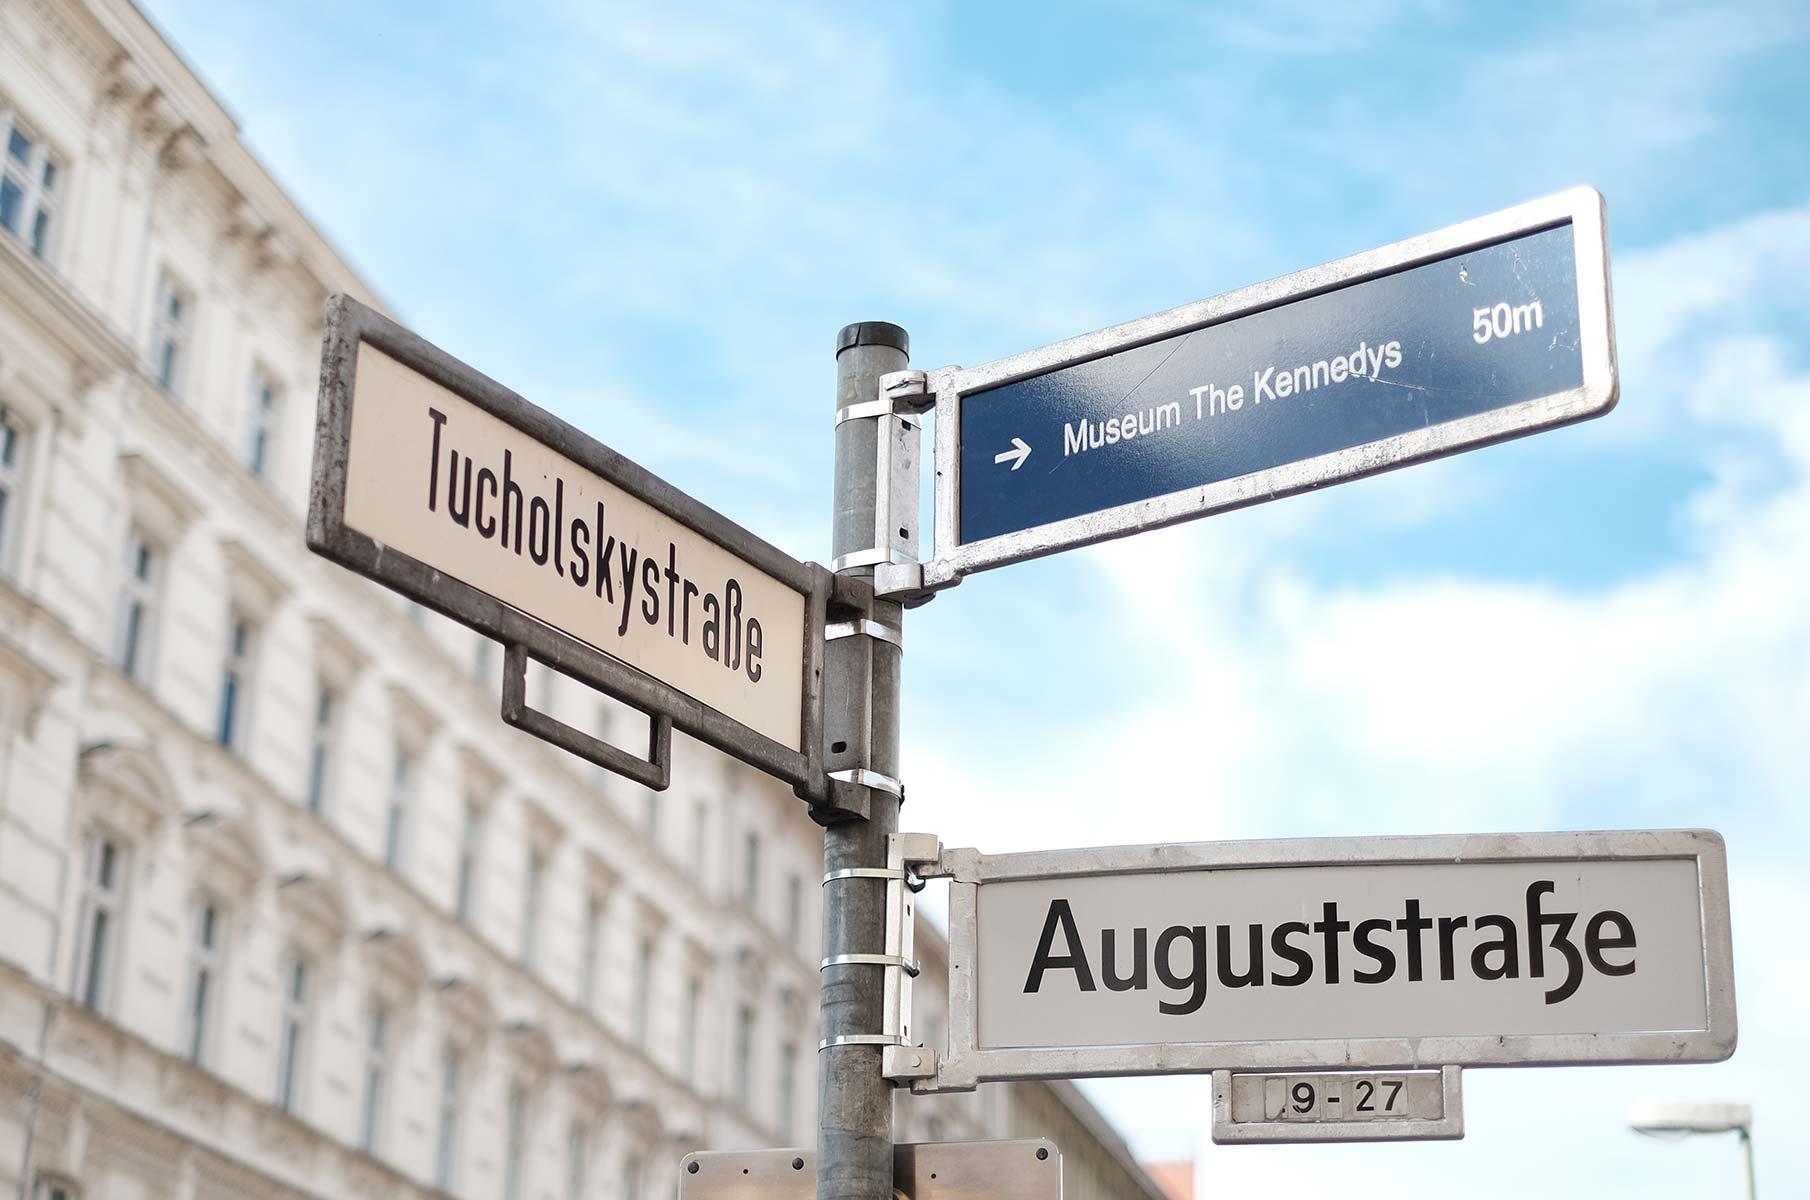 Tucholskystraße in Berlin